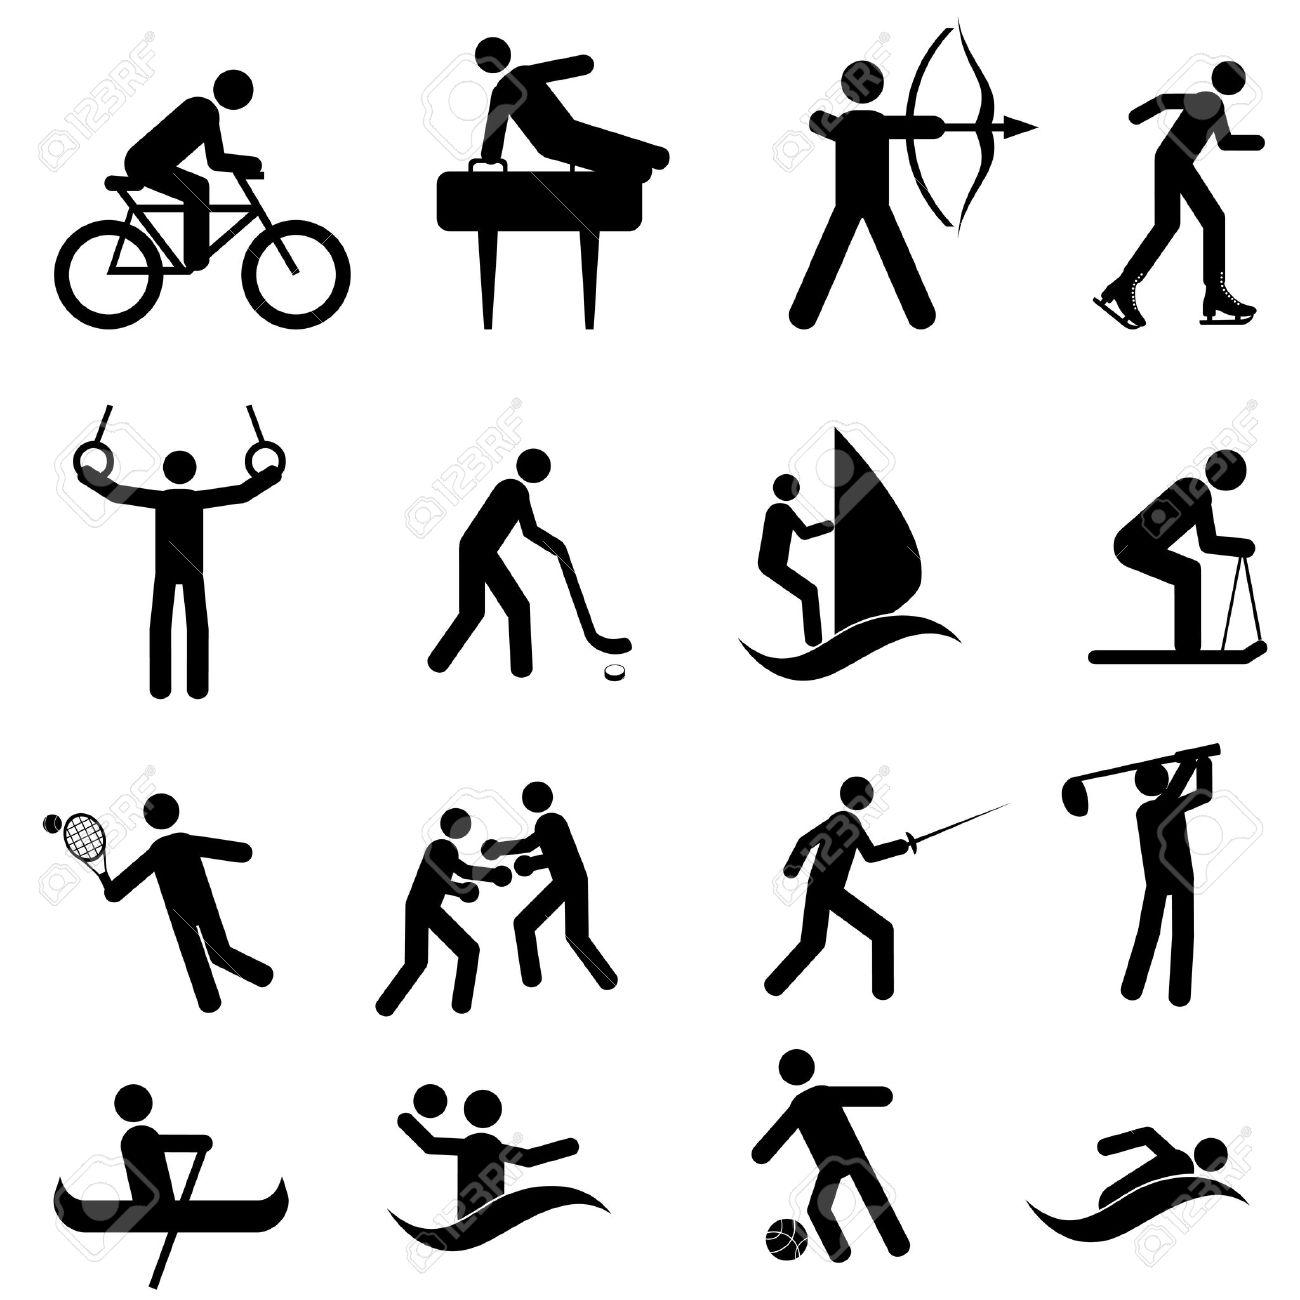 Leisure Activity Clipart